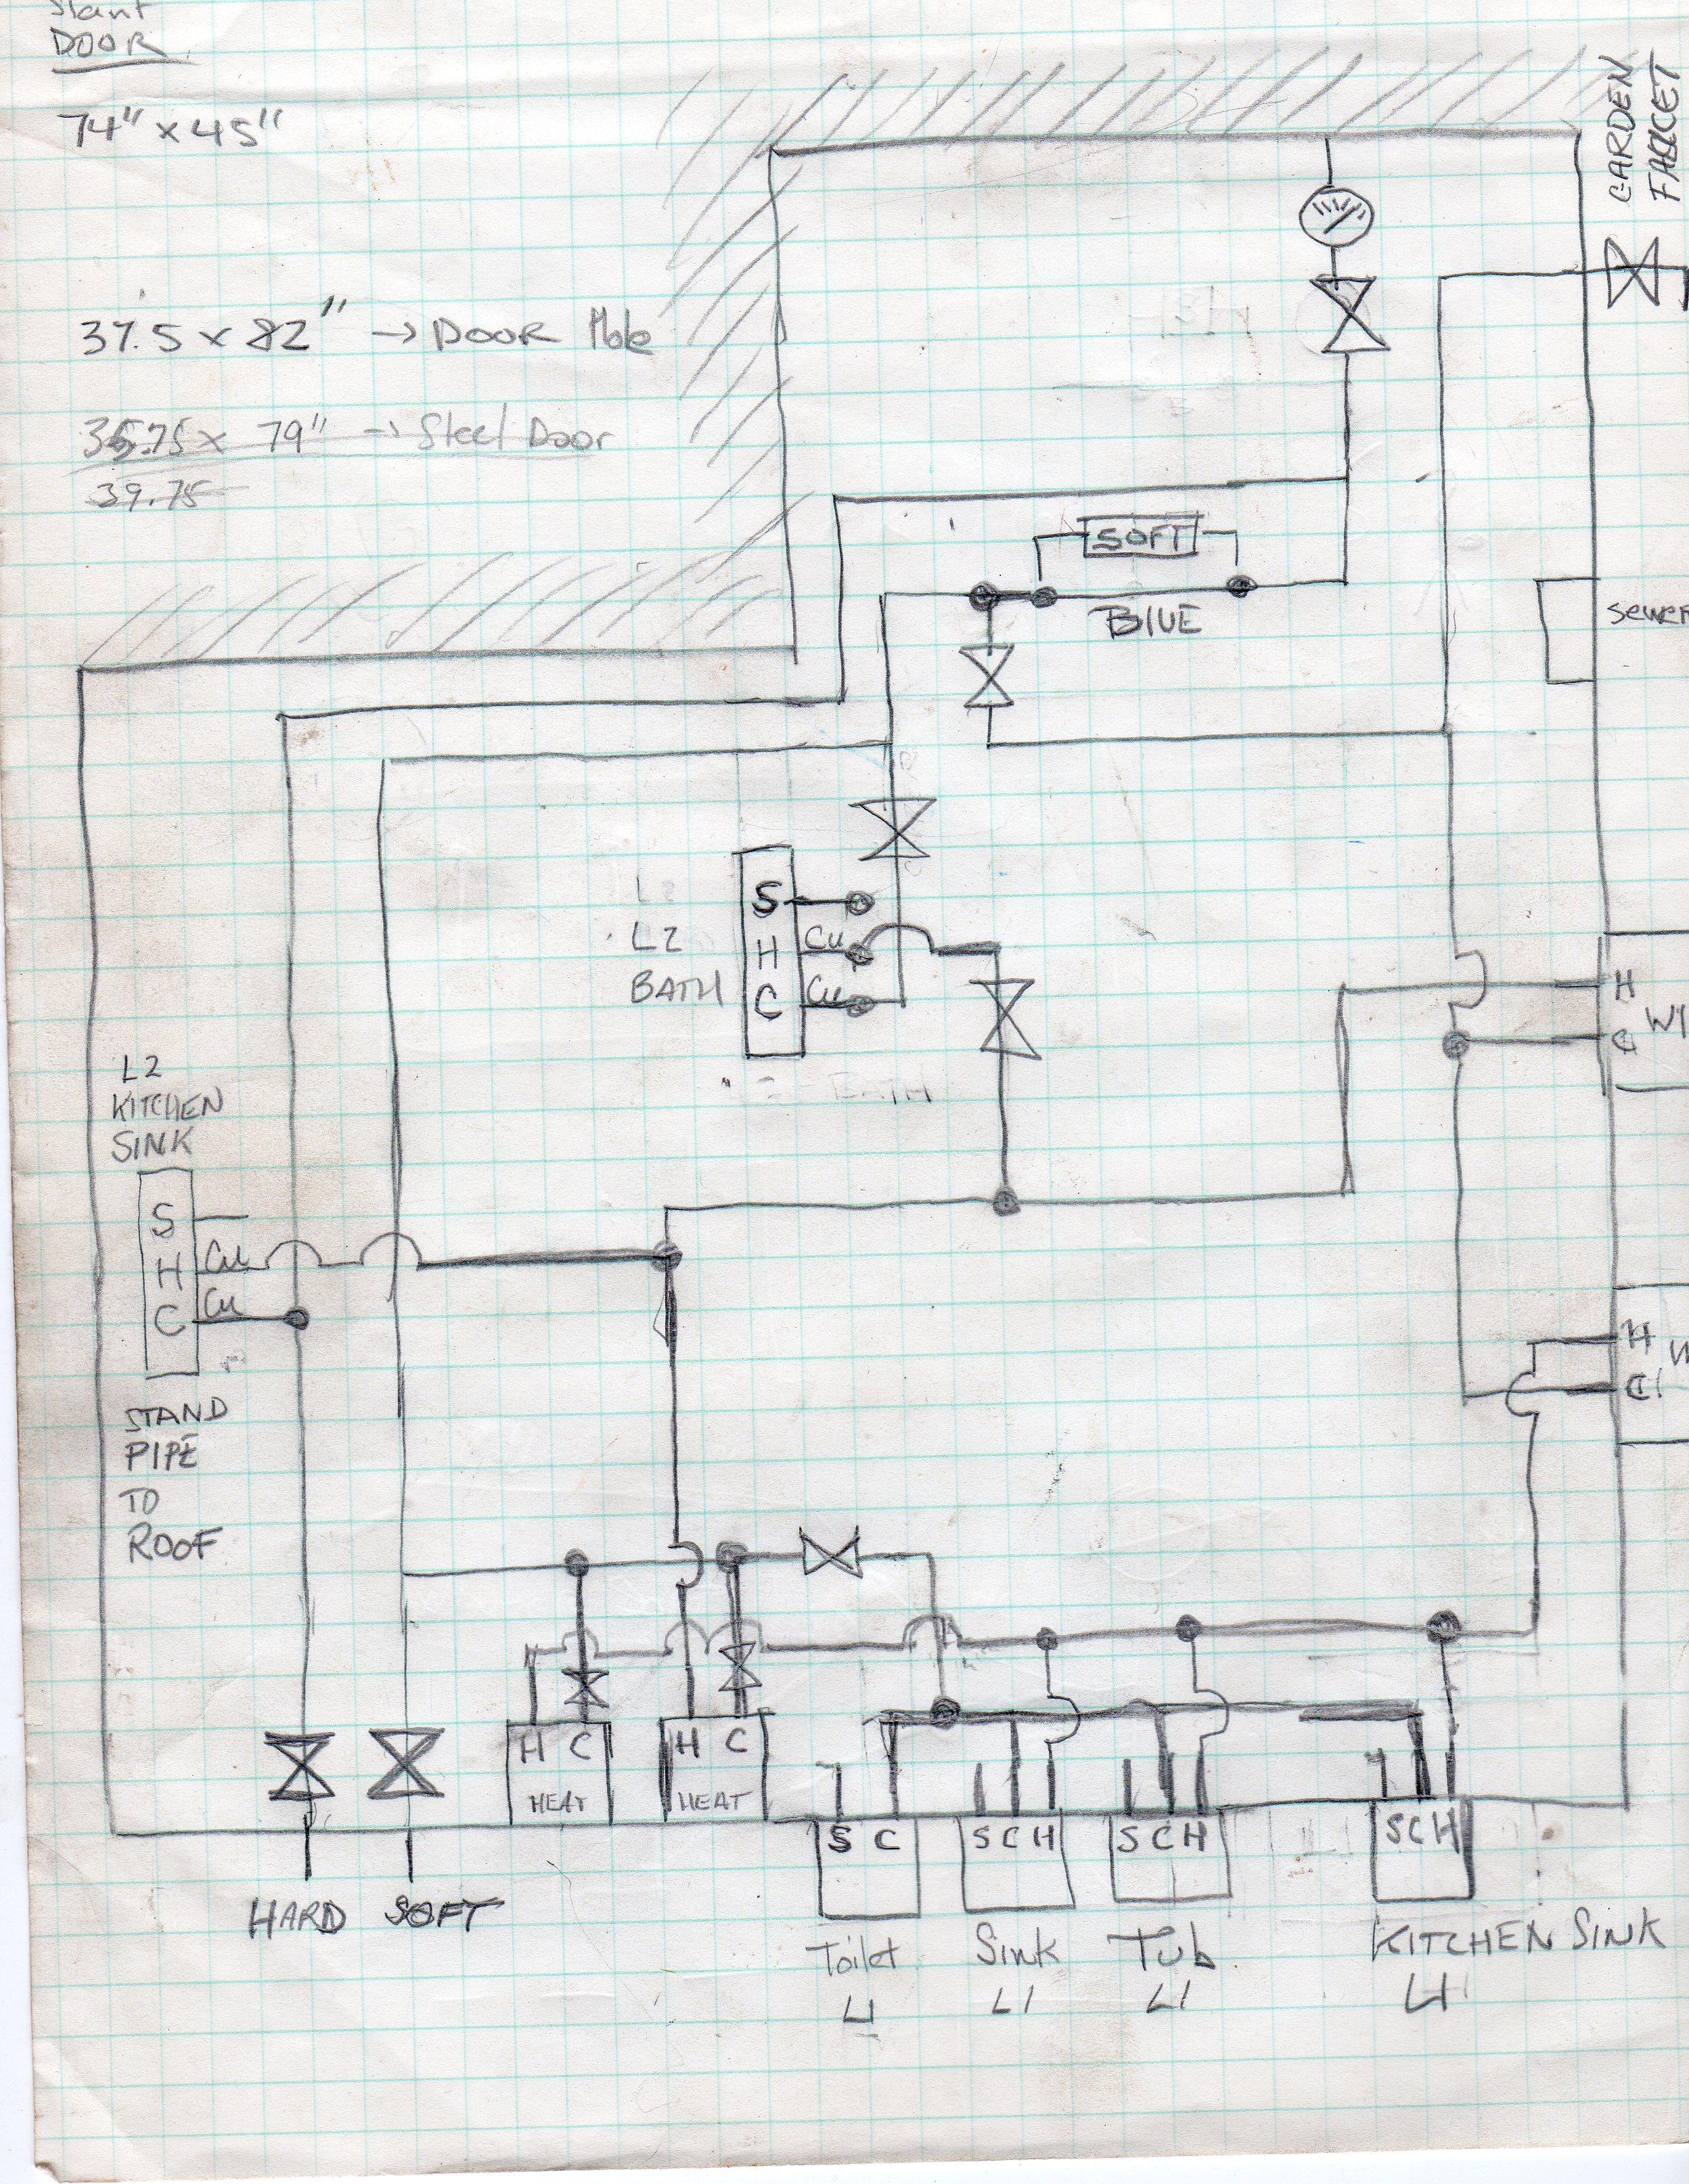 Replacing A Cellar Wall Drain Line And Plumbing Diagrams